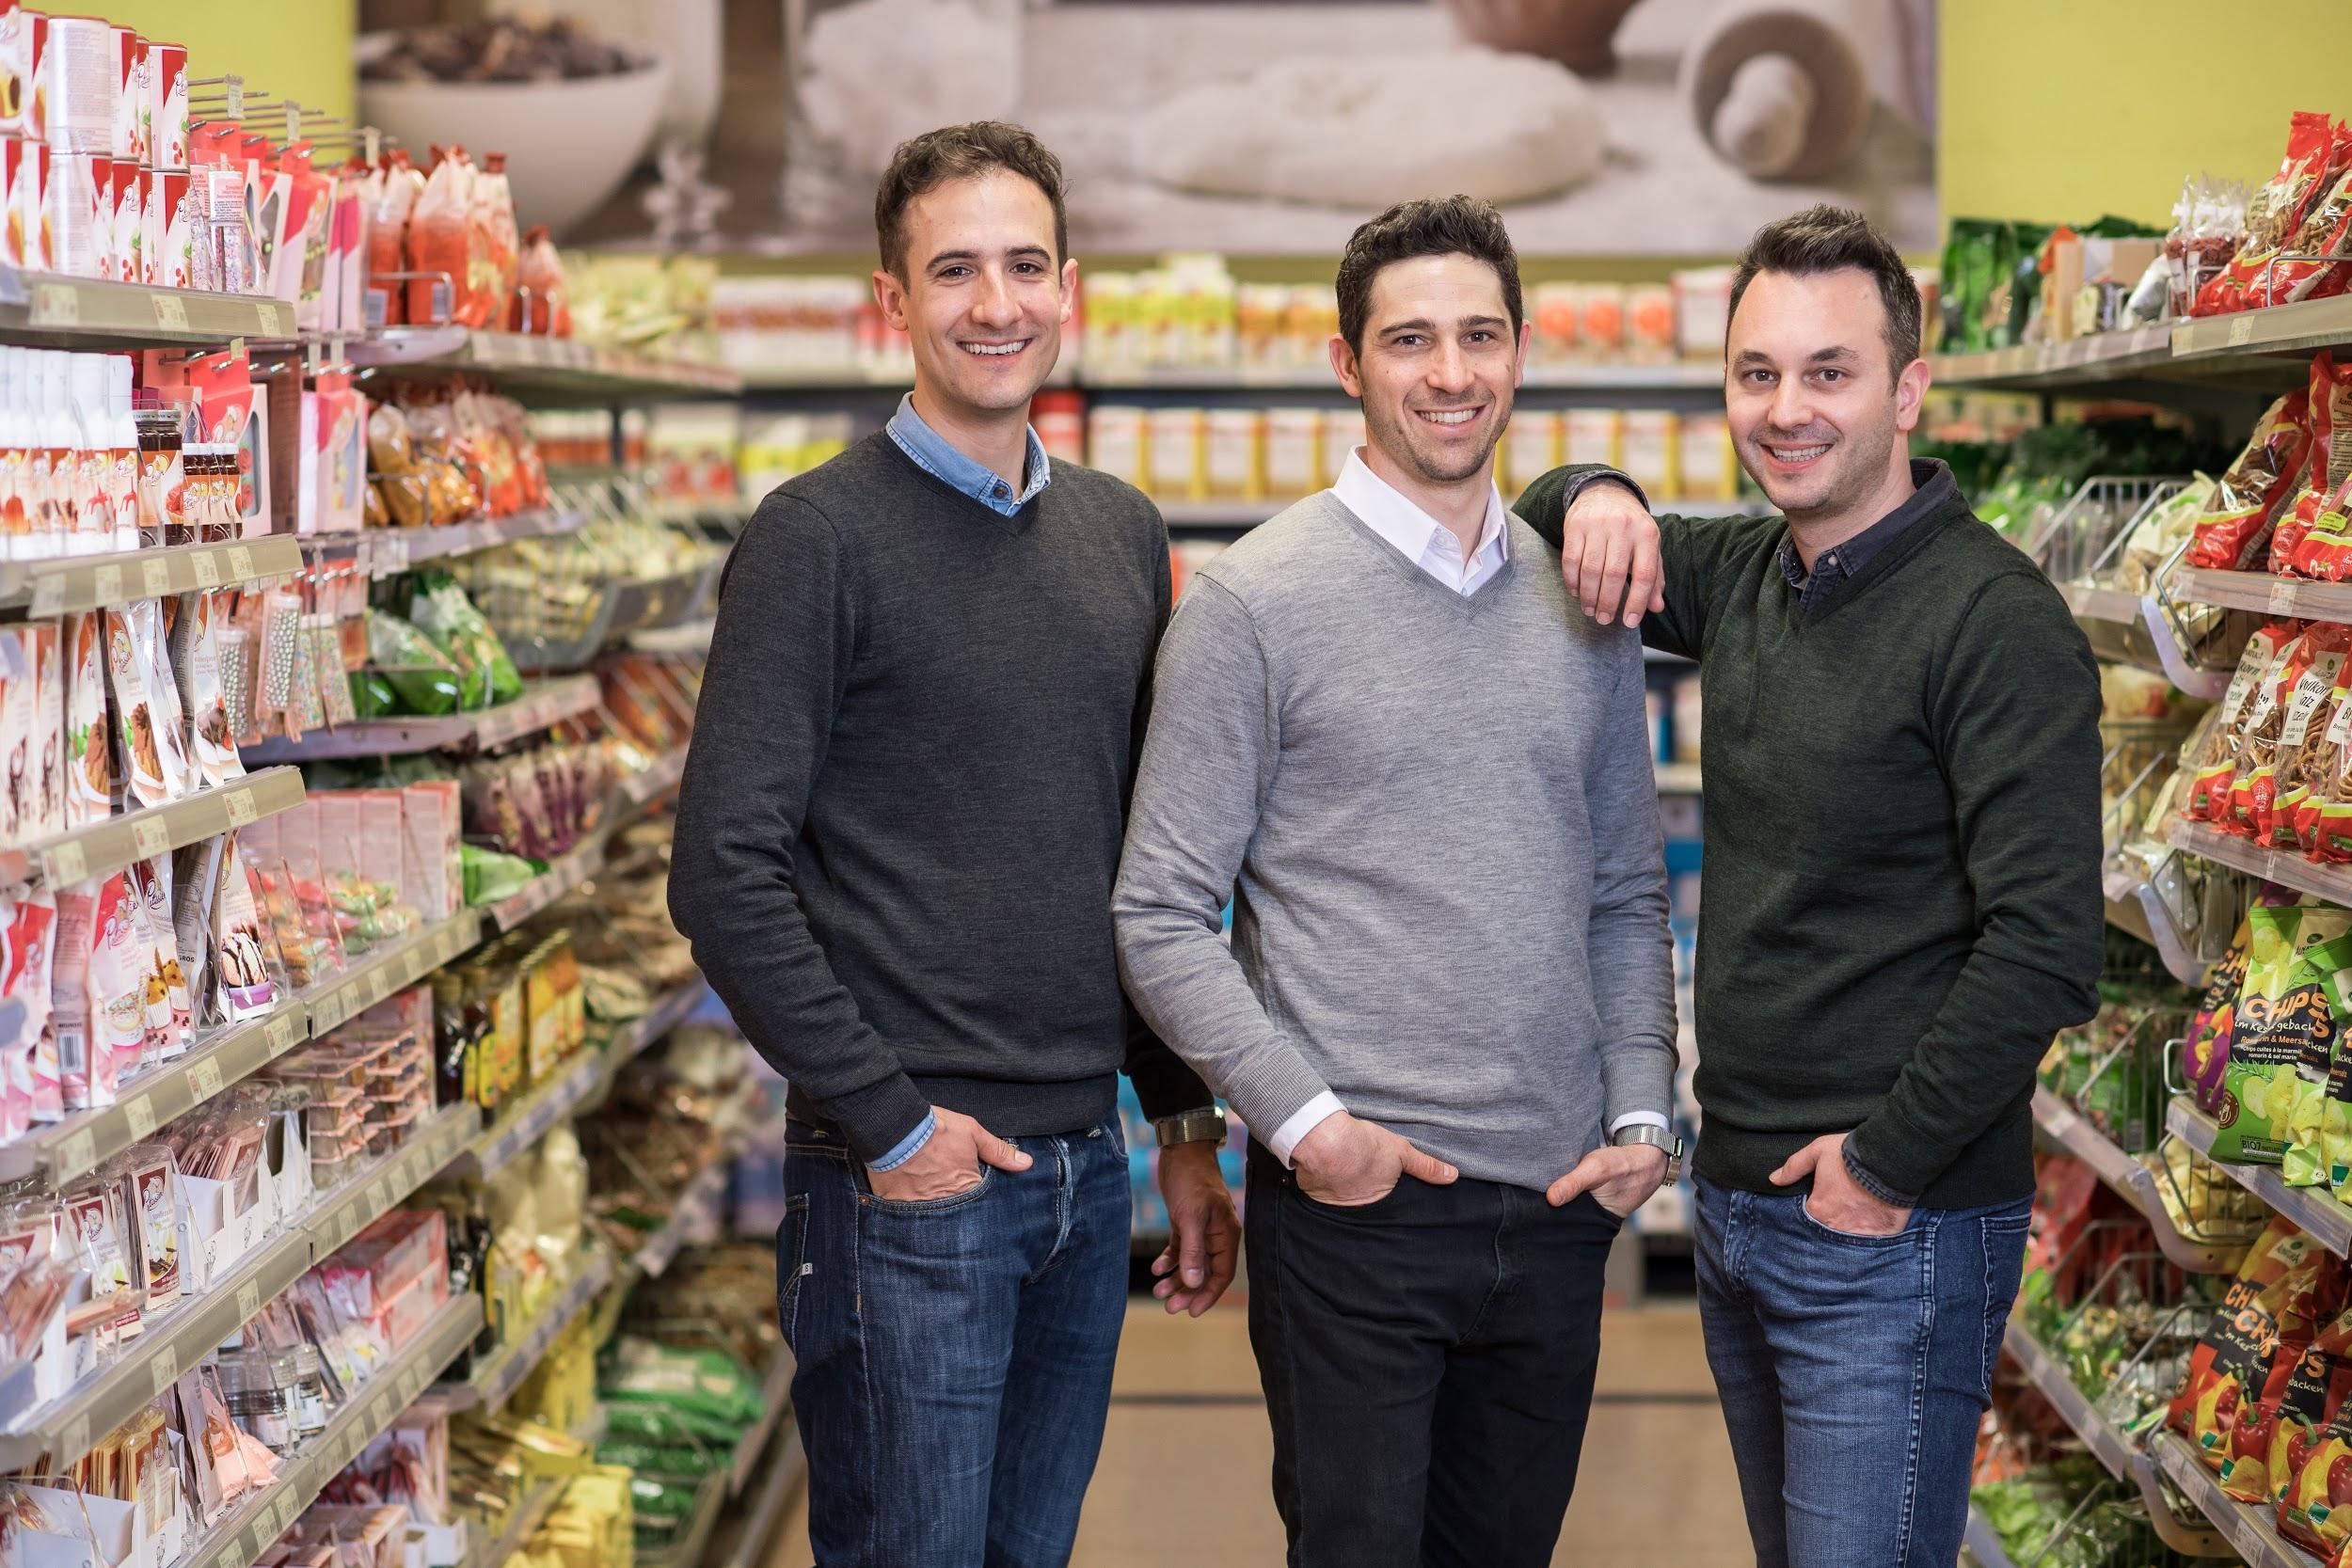 Bring! founders: Marco Cerqui, Dominic Mehr, Sandro Strebel.